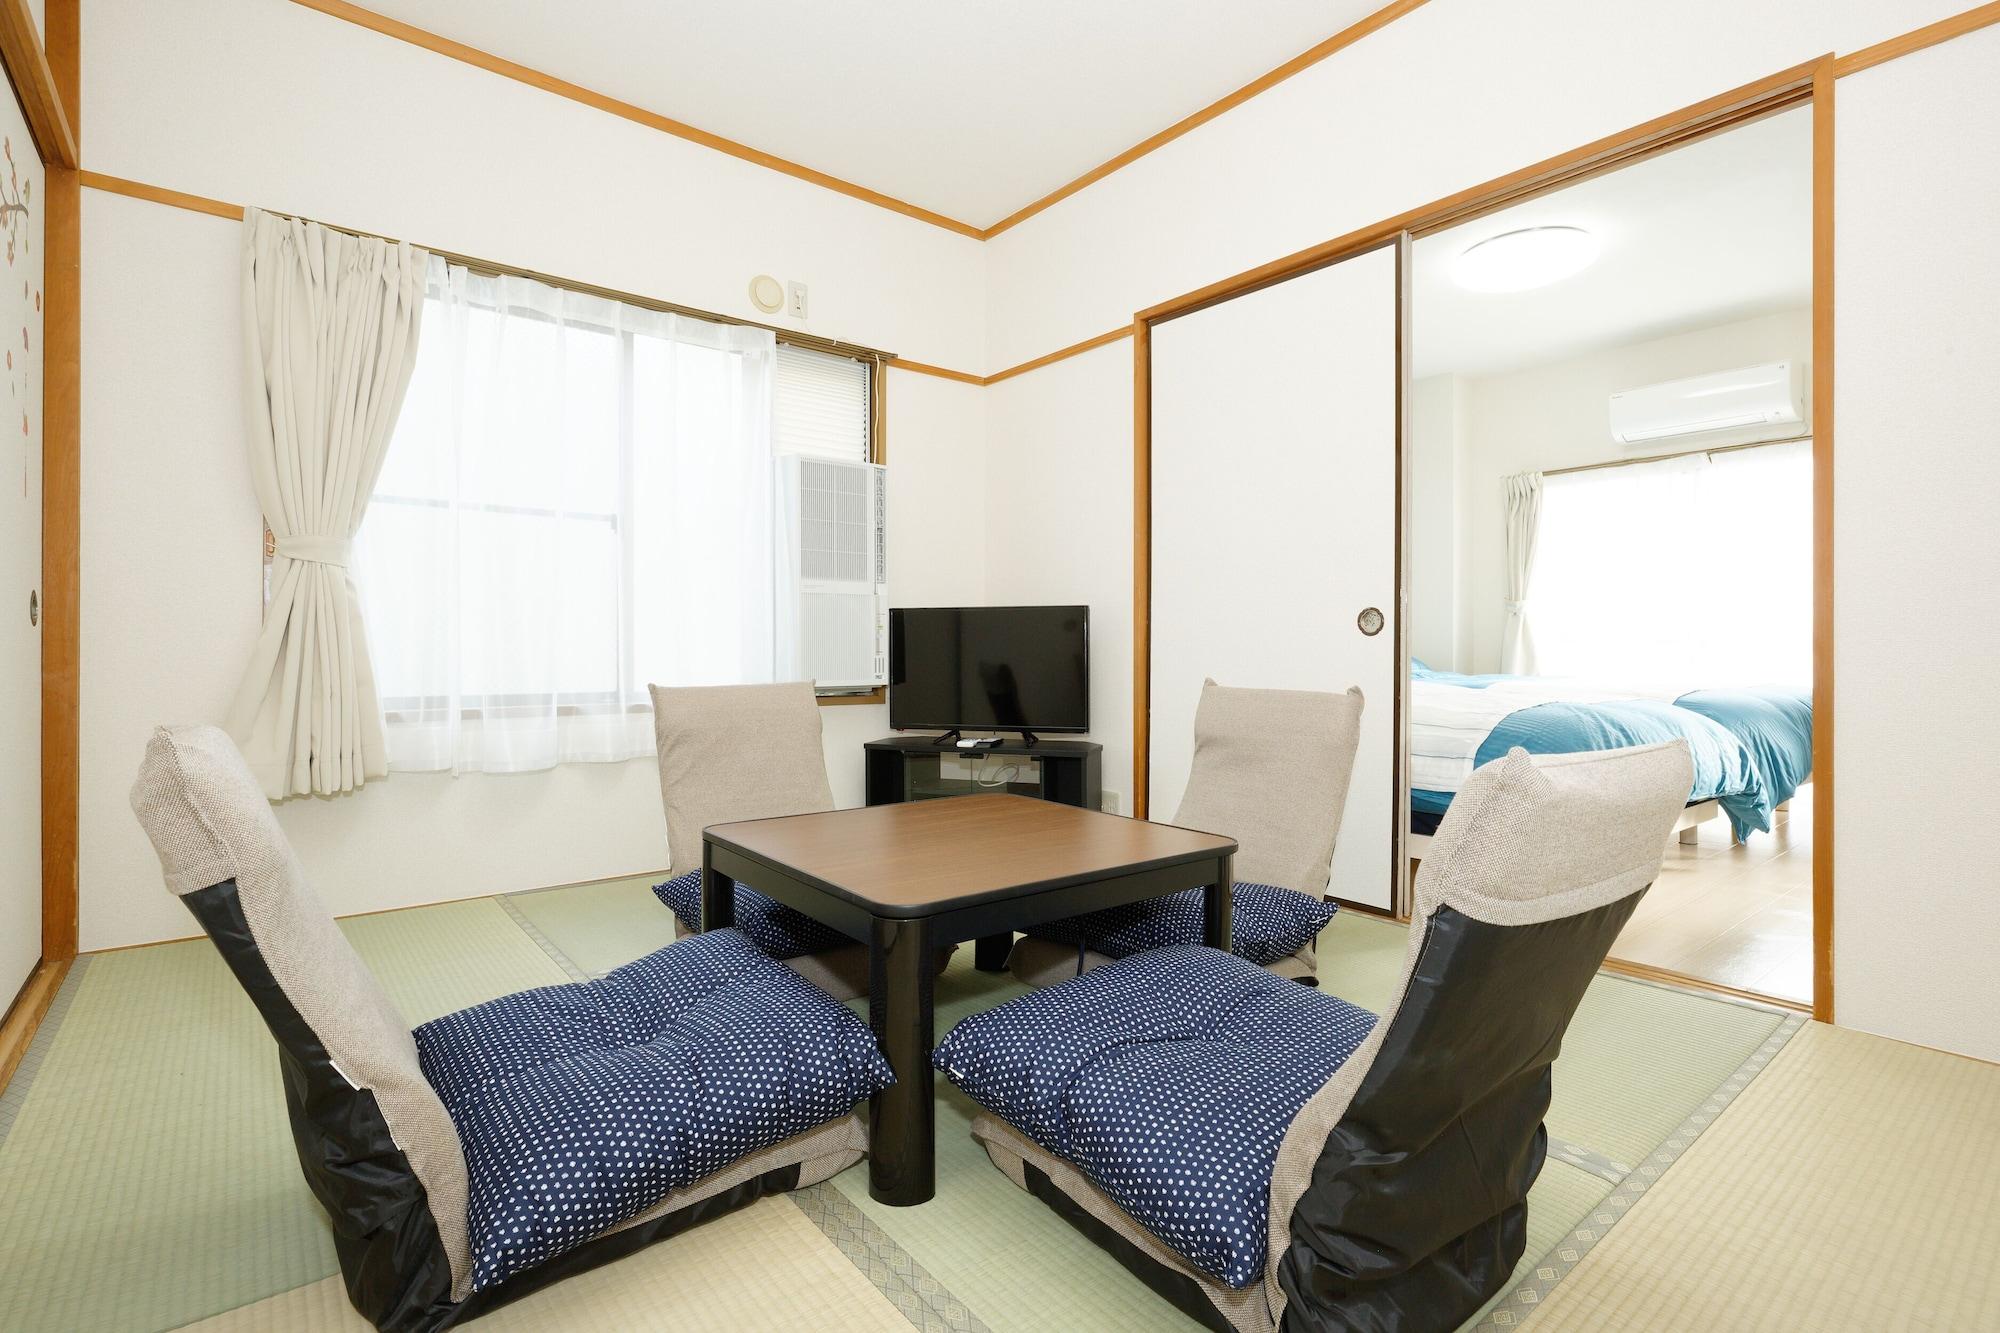 201 Habitación Ichibankan, Katsushika